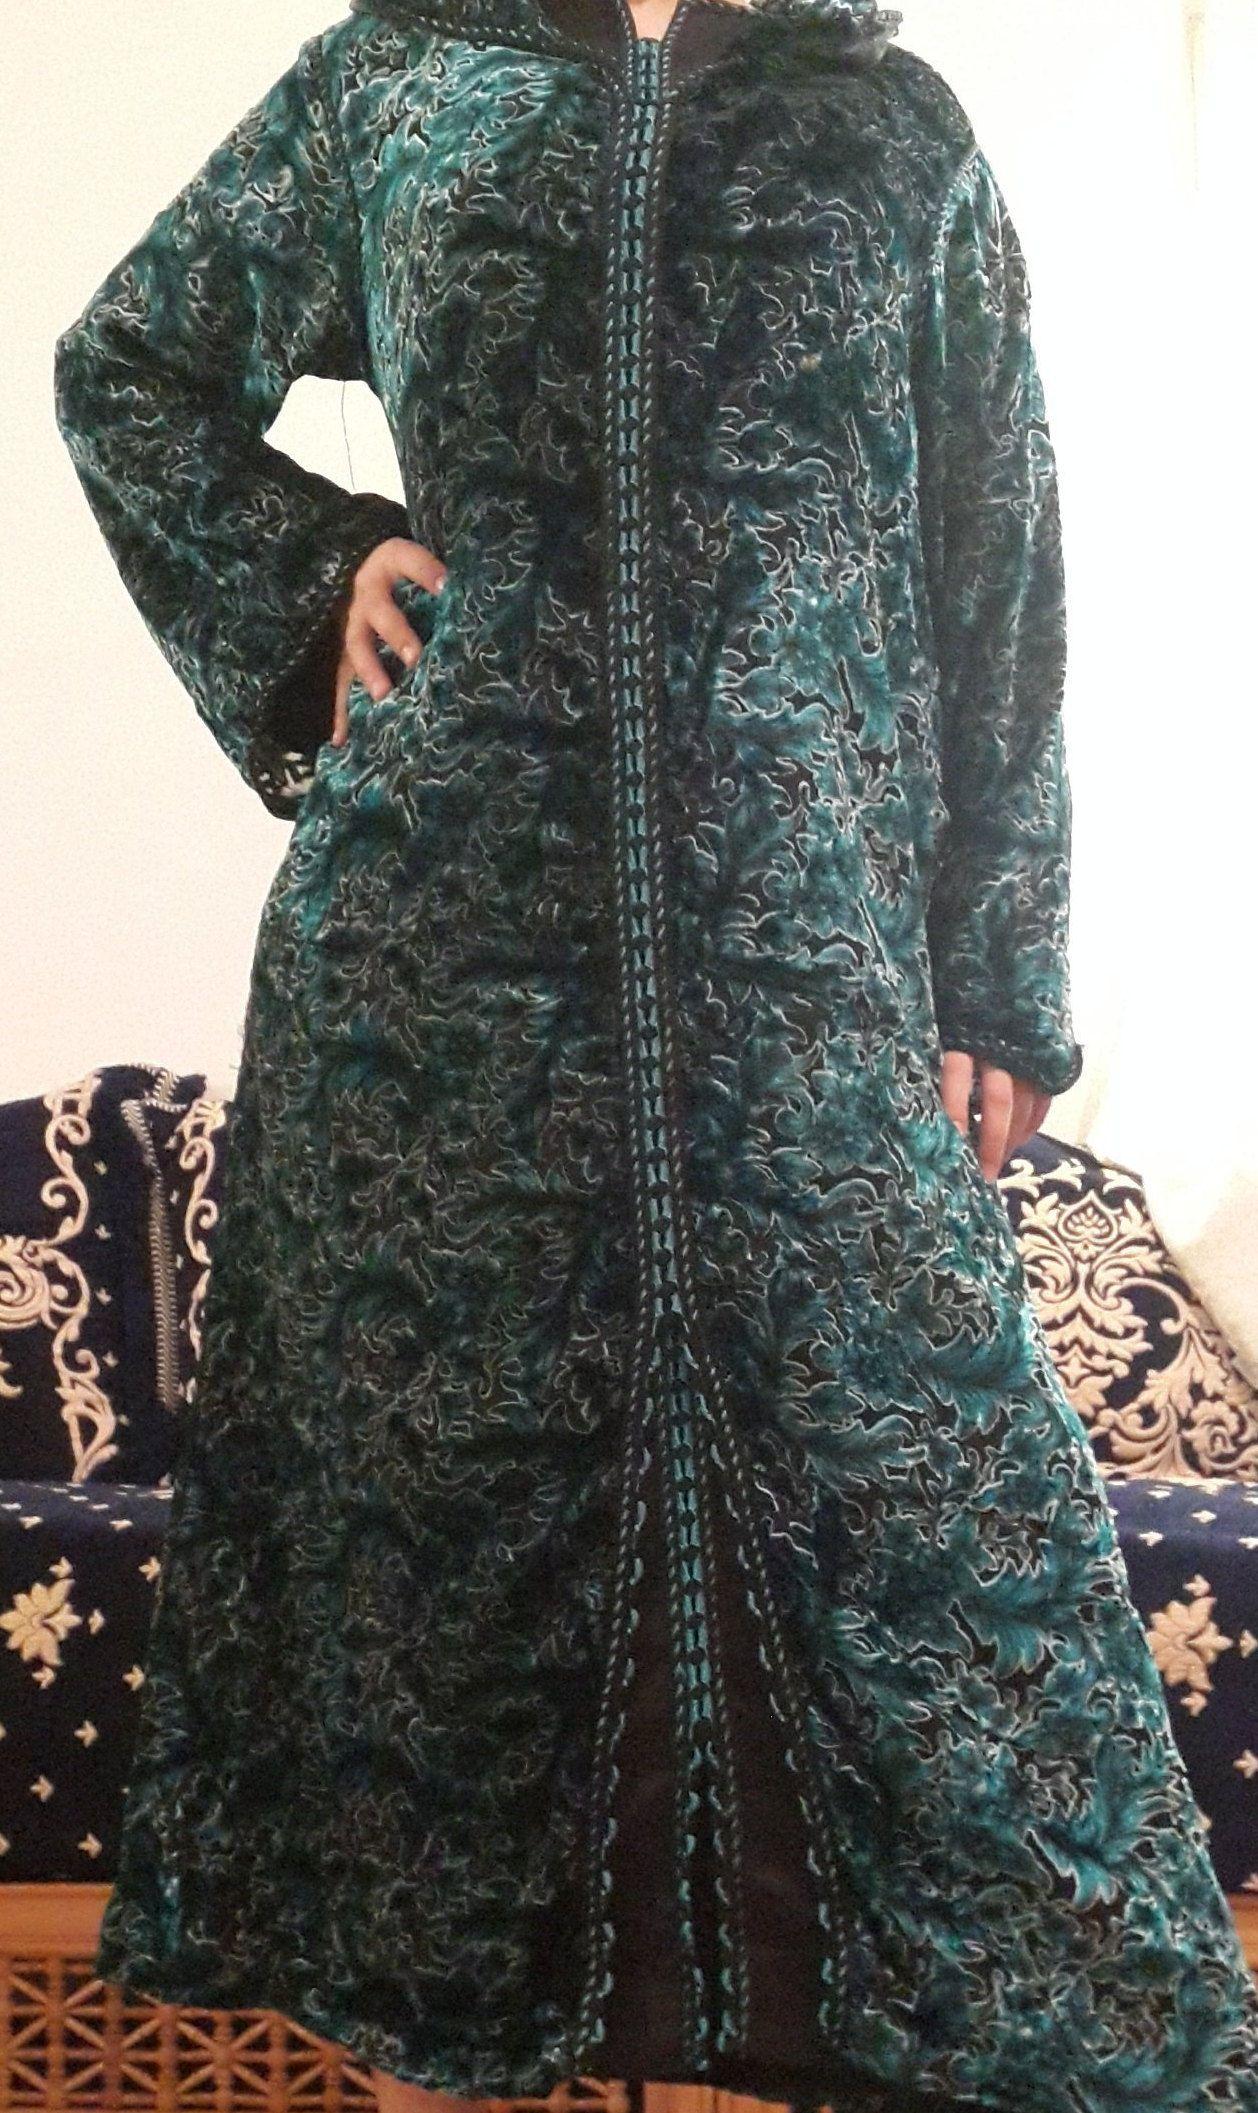 Caftan Kaftan Handmade Djellaba Jellaba Abaya Blouse African Moroccan X-large